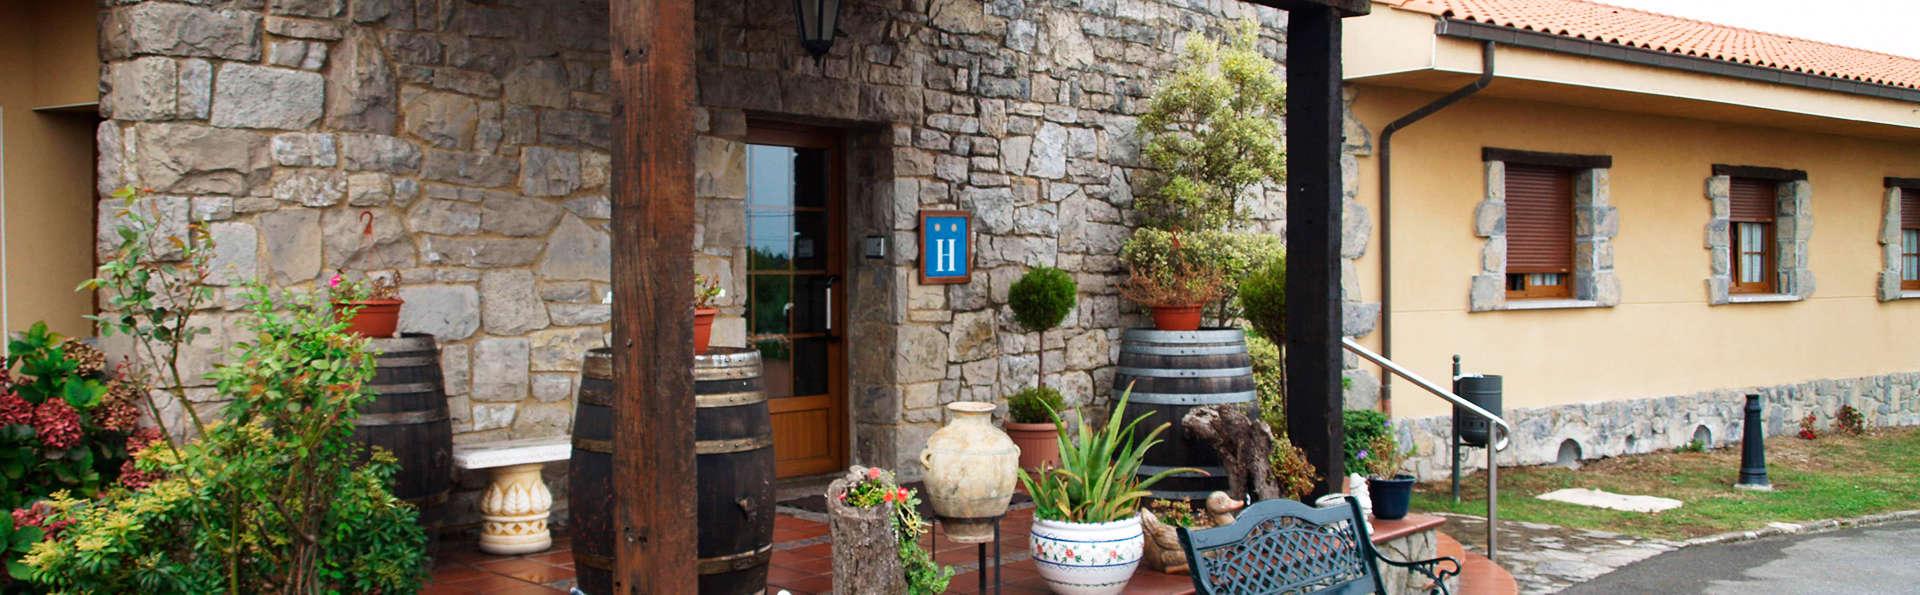 Hotel Villa San Remo - EDIT_front1.jpg